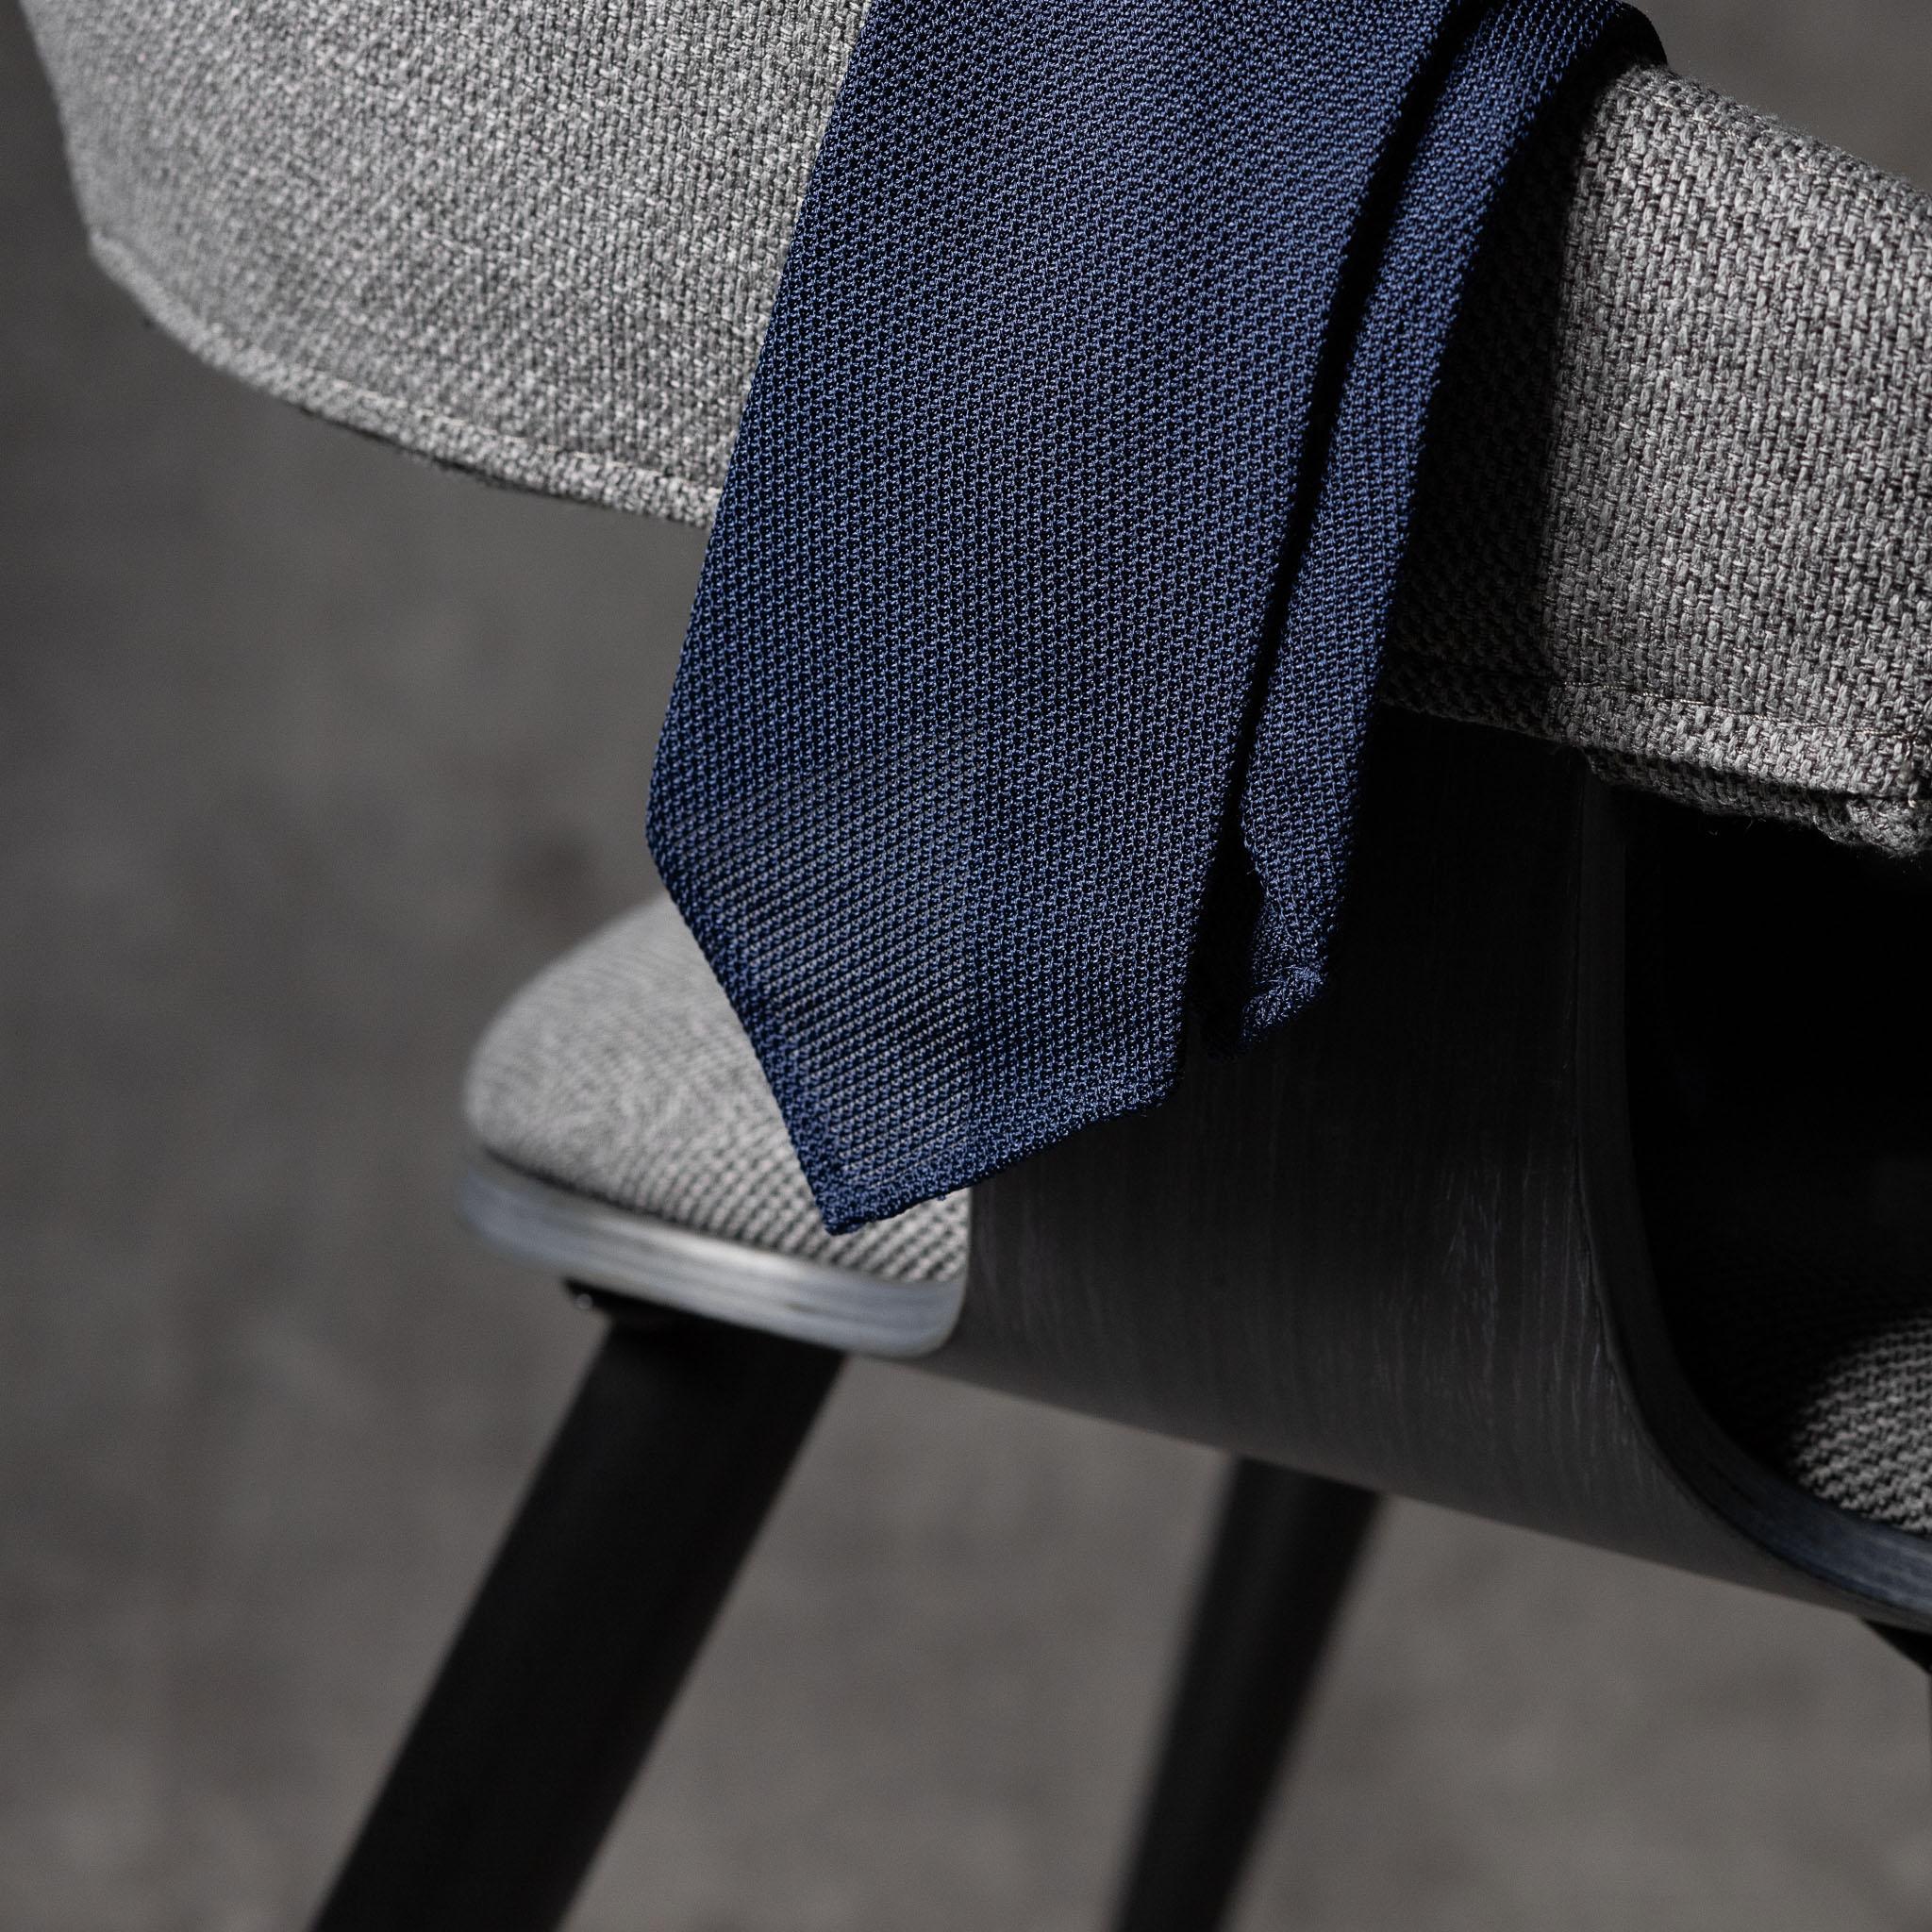 GRENADINE-0280-Tie-Initials-Corbata-Iniciales-The-Seelk-2